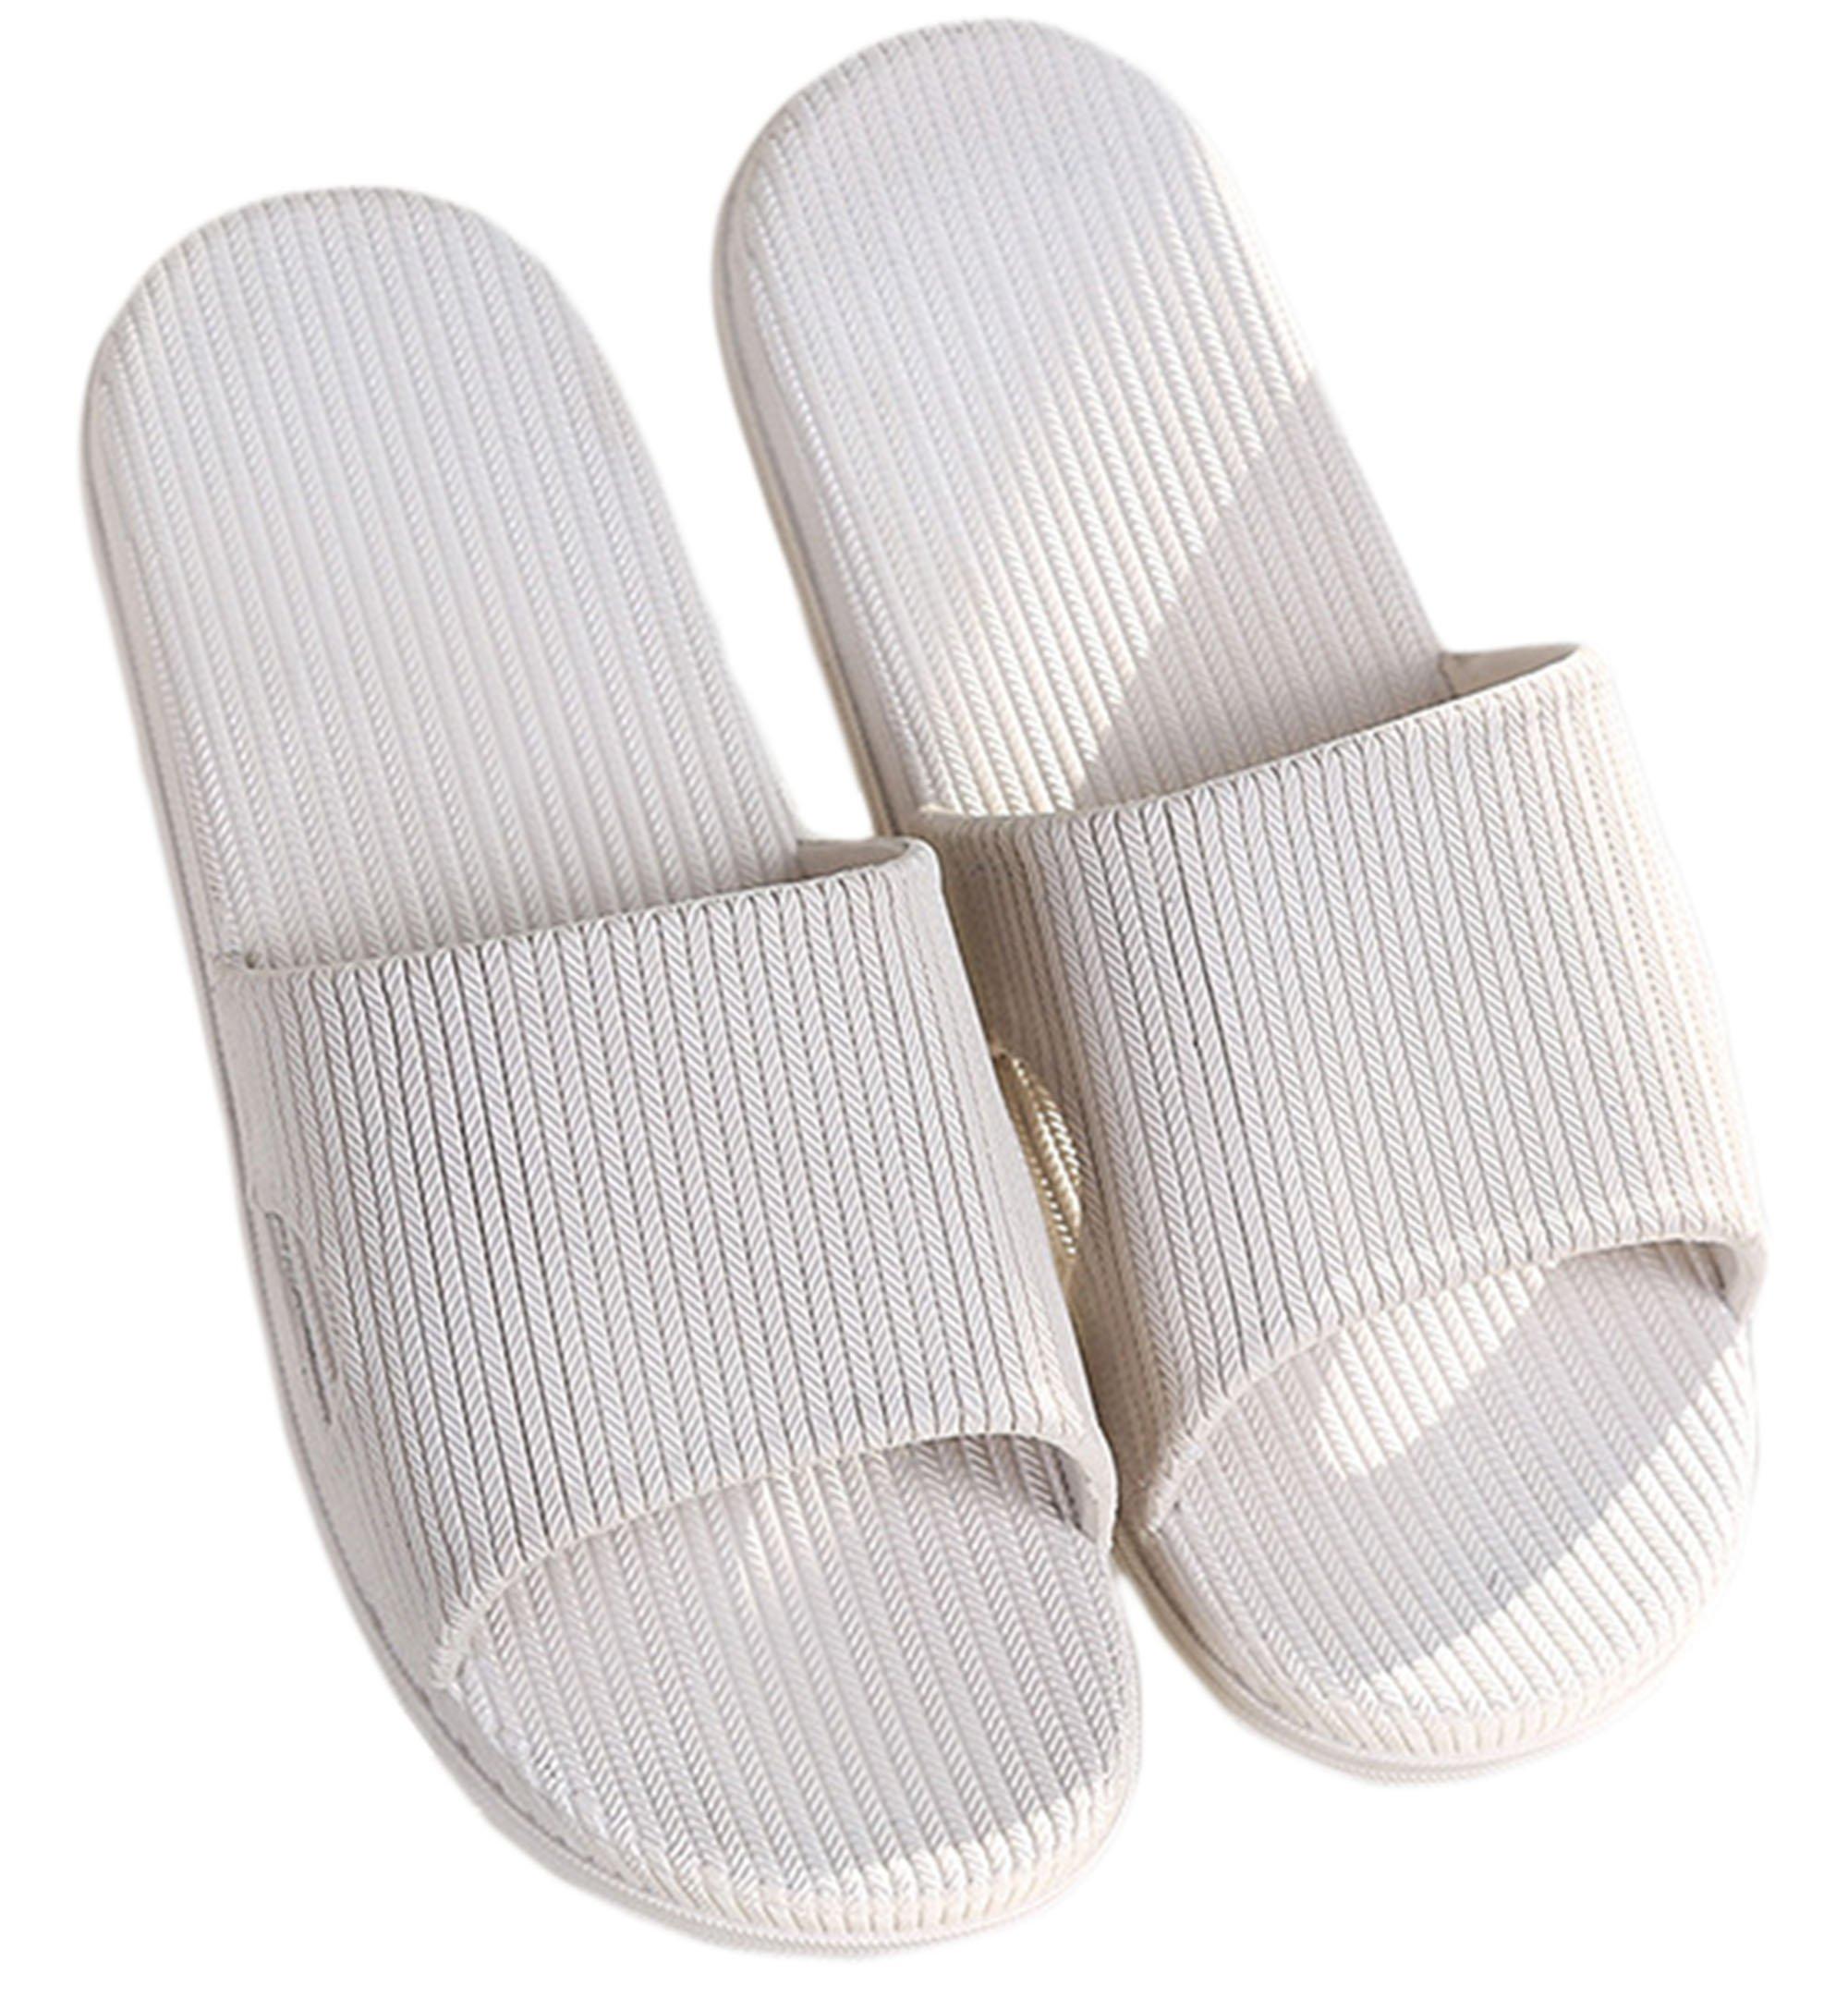 Knolee Unisex Rubber Sole Simple Indoor Shoes Bath Slip-Resistant Slippers,White7-7.5 D(M) US